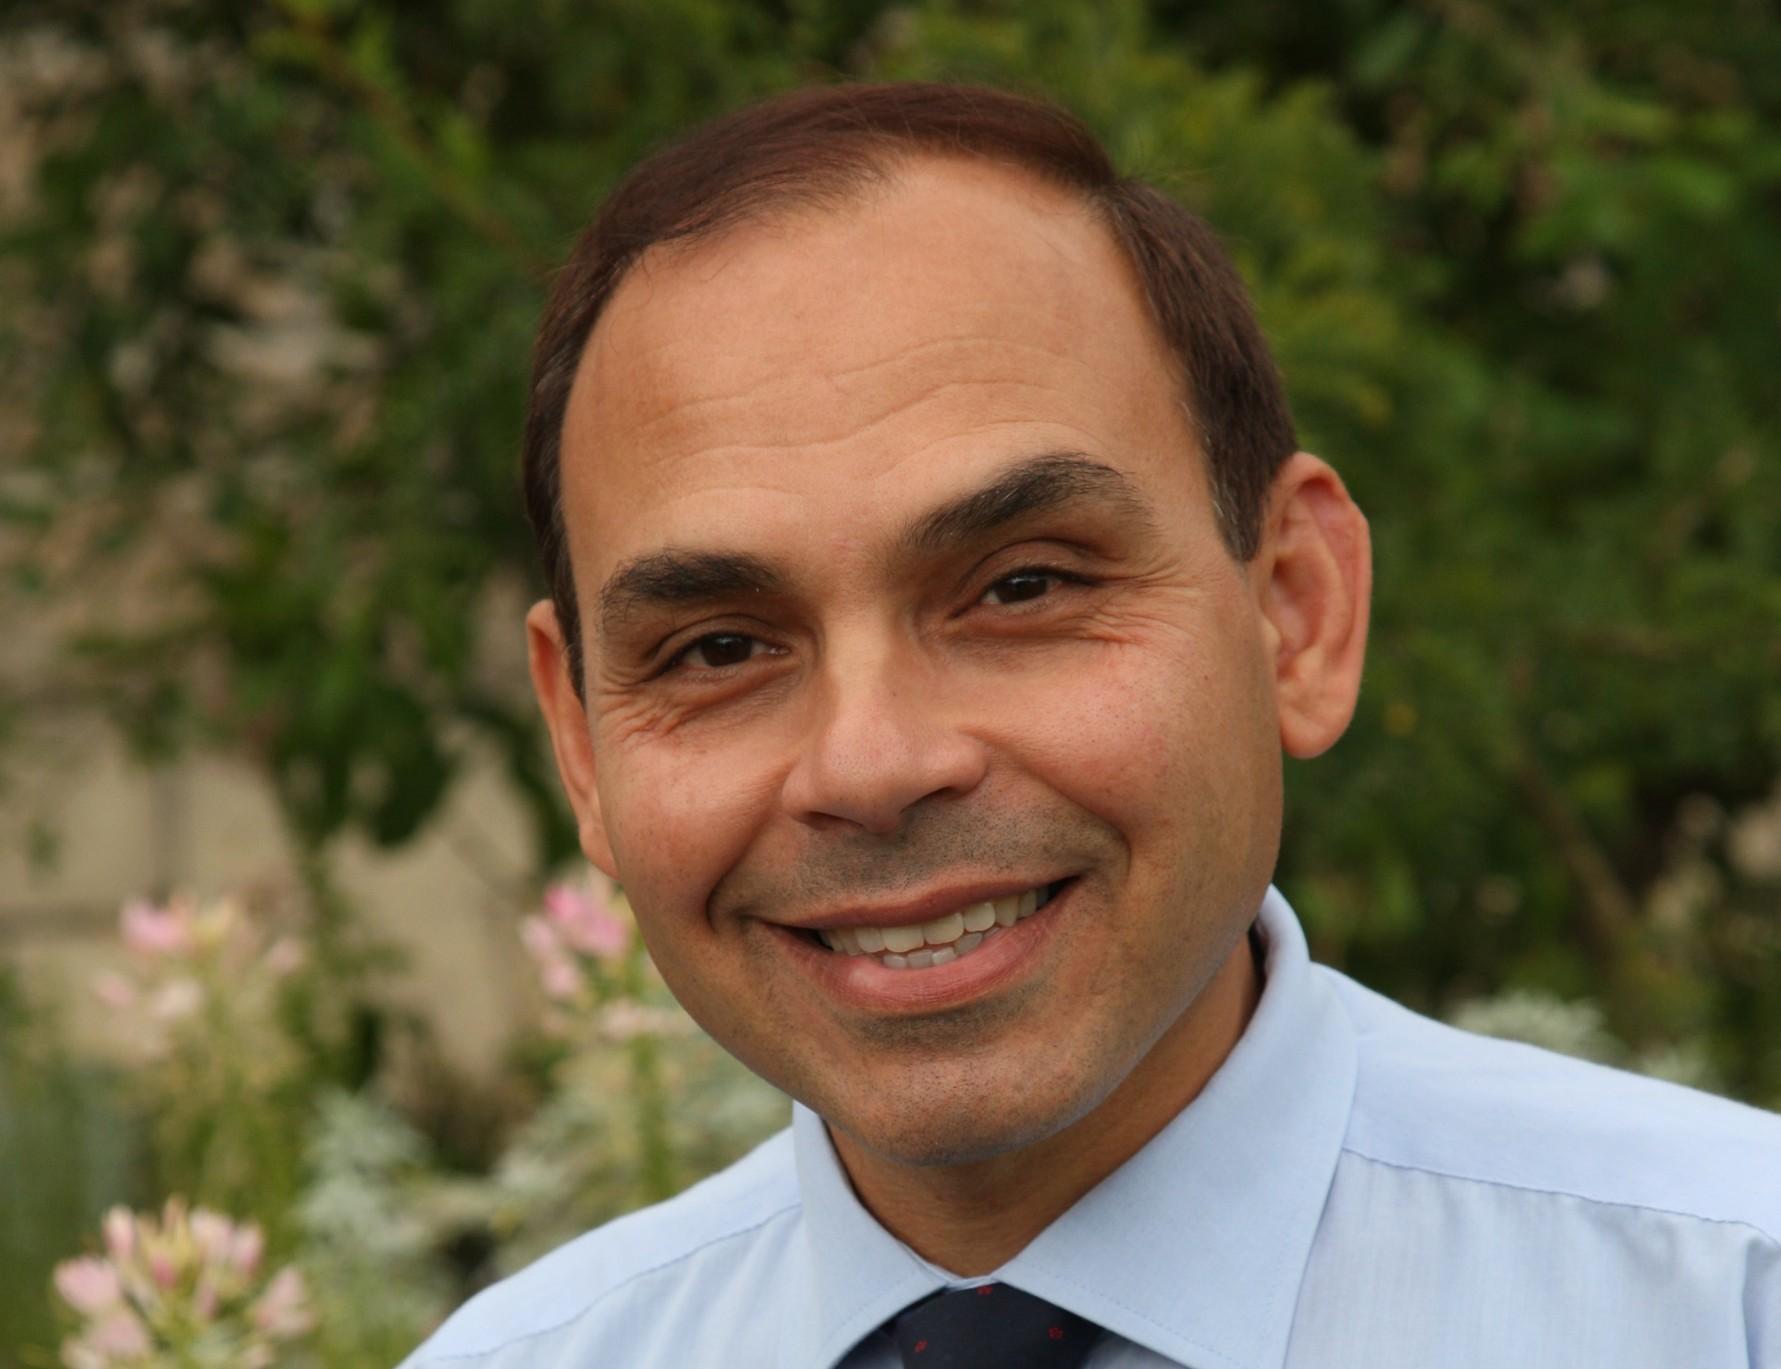 Professor Kamel Boulos